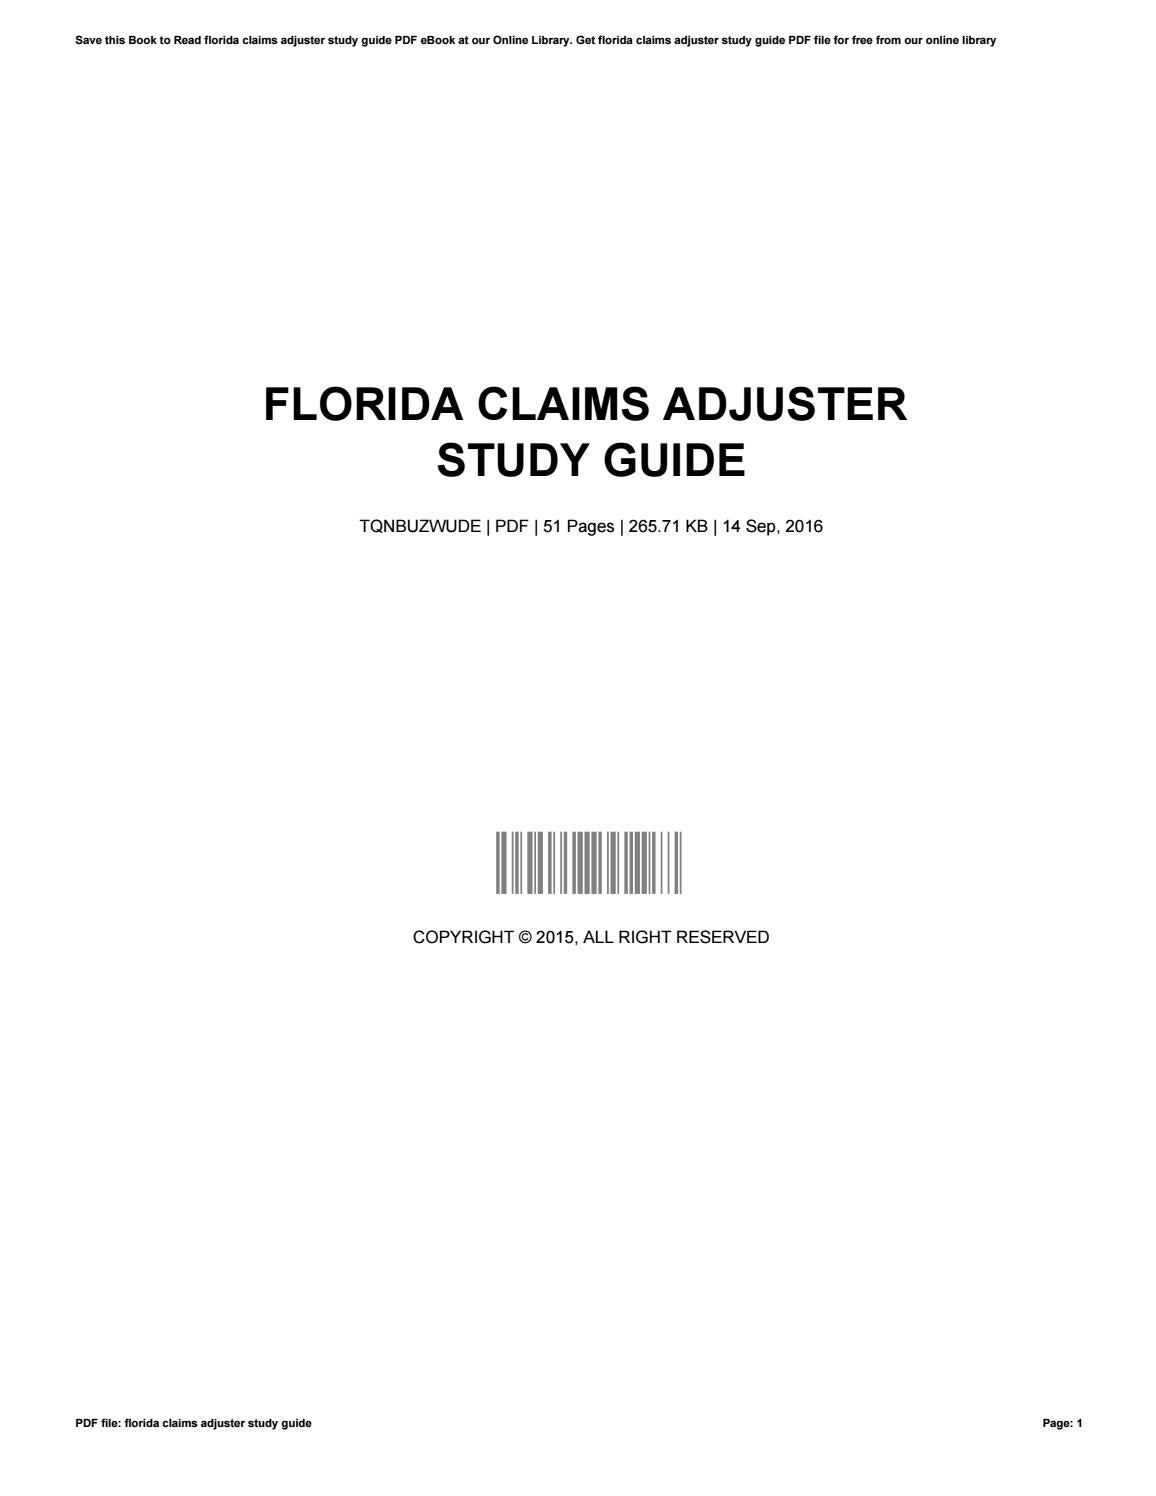 Florida adjusters study